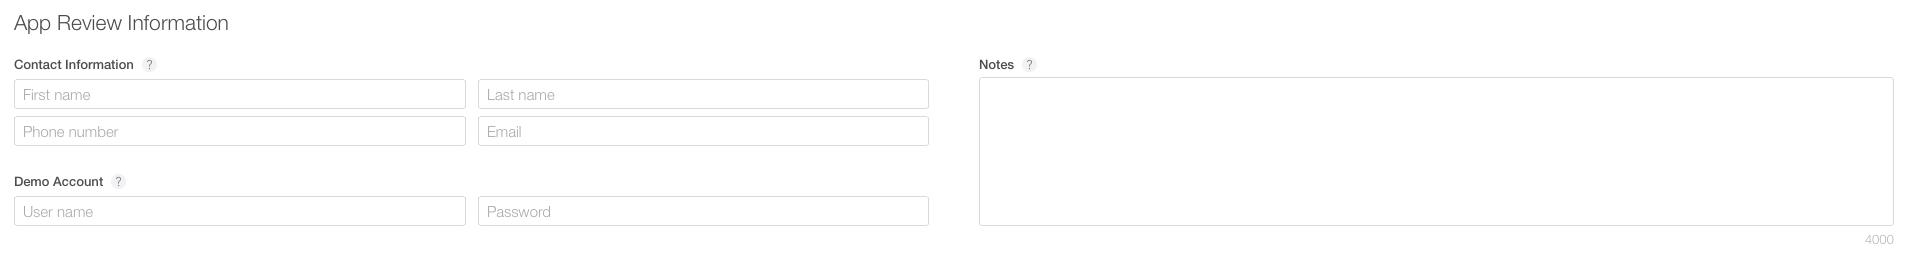 Configuring an App in iTunes Connect - Xamarin   Microsoft Docs